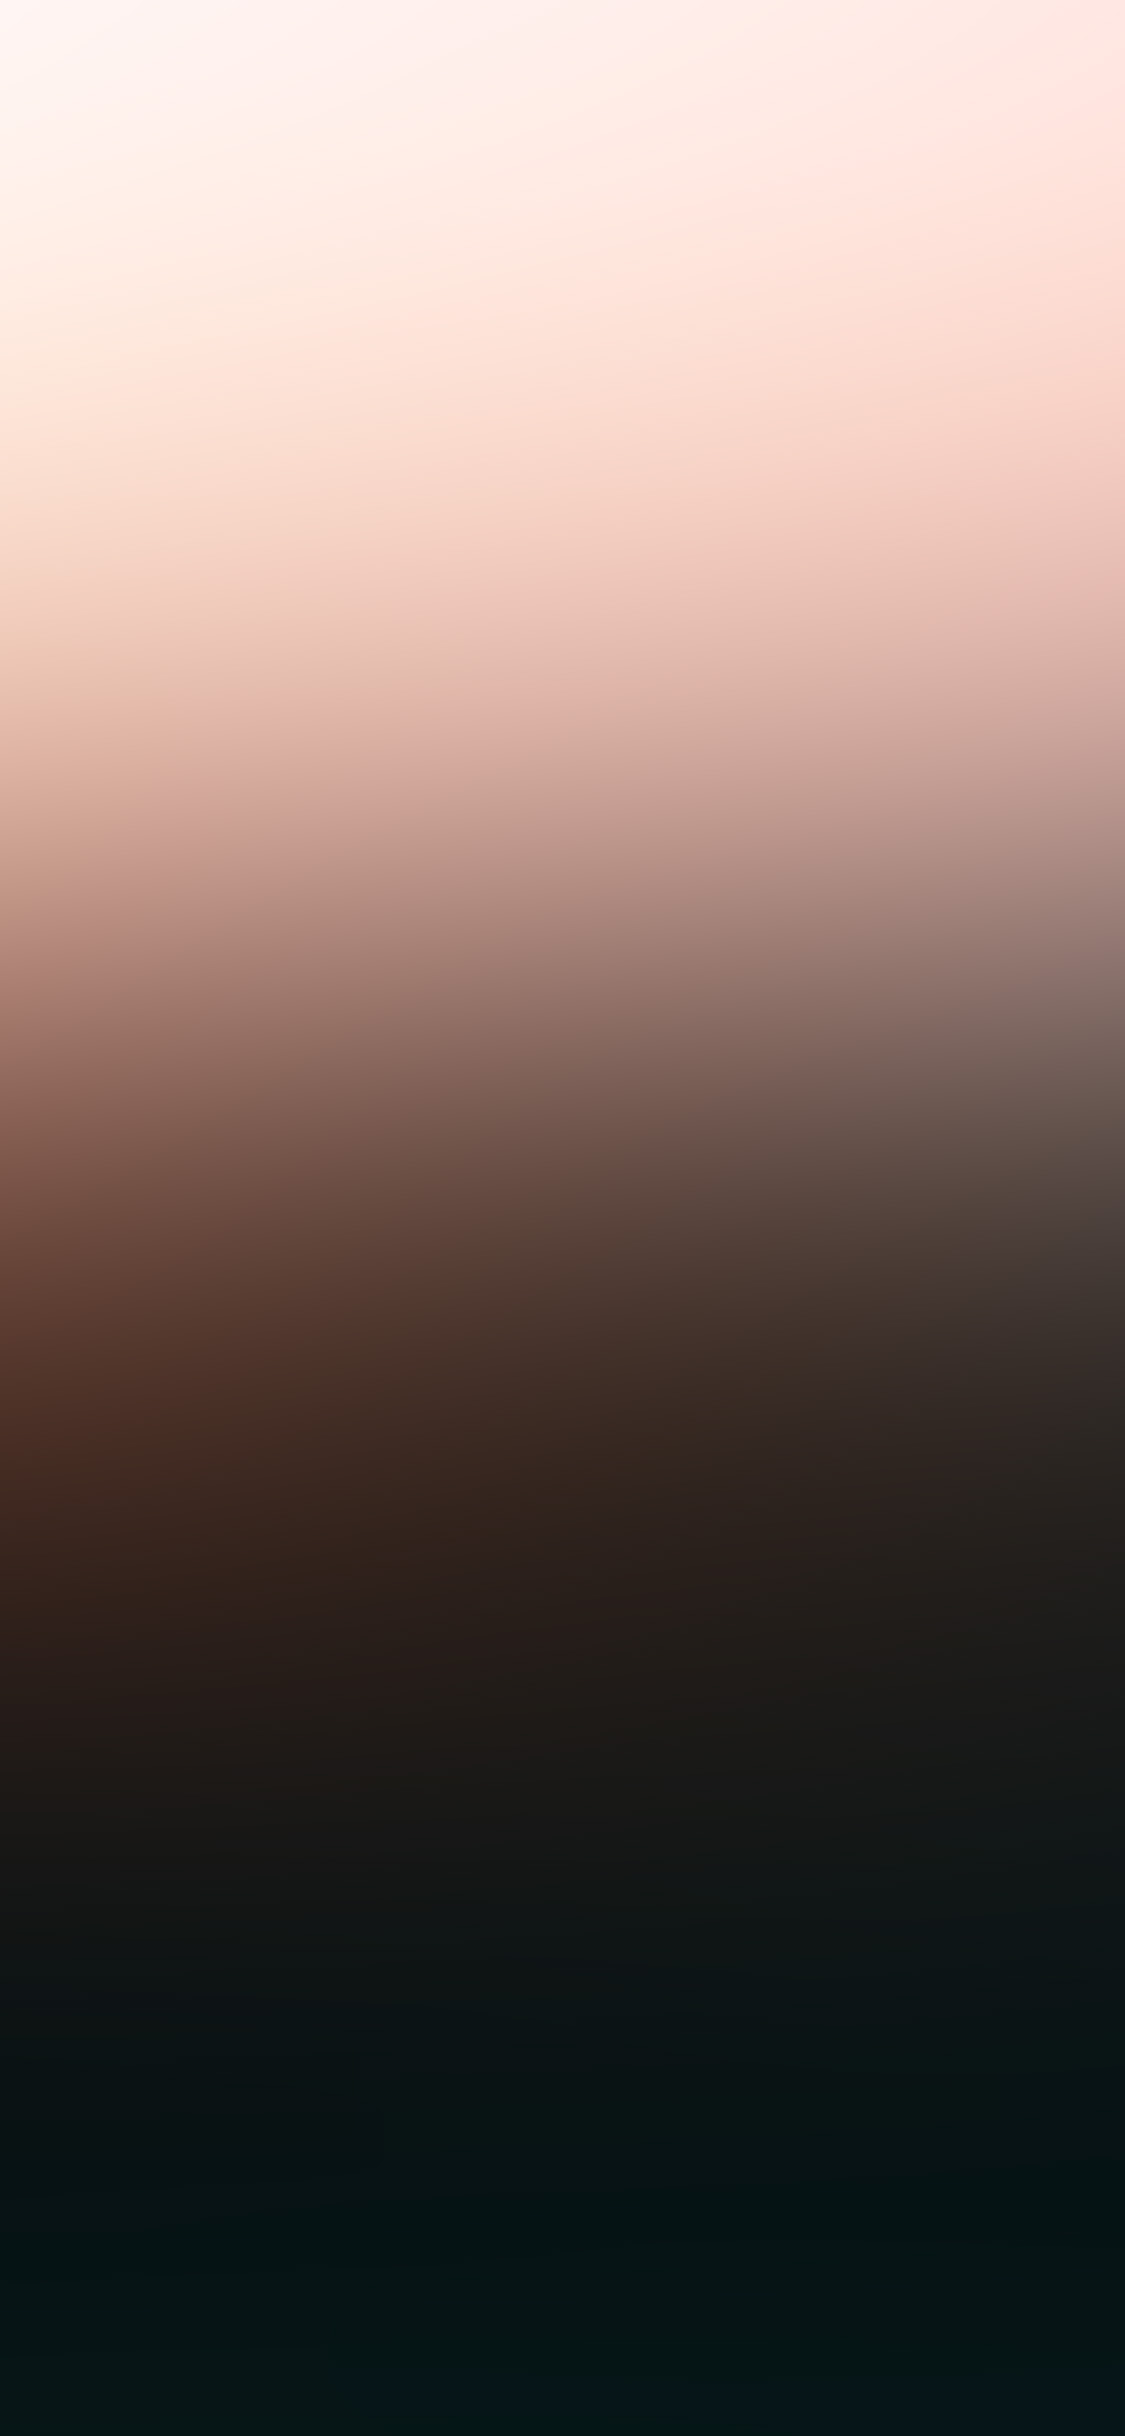 iPhonexpapers.com-Apple-iPhone-wallpaper-sm78-sunset-soft-blur-gradation